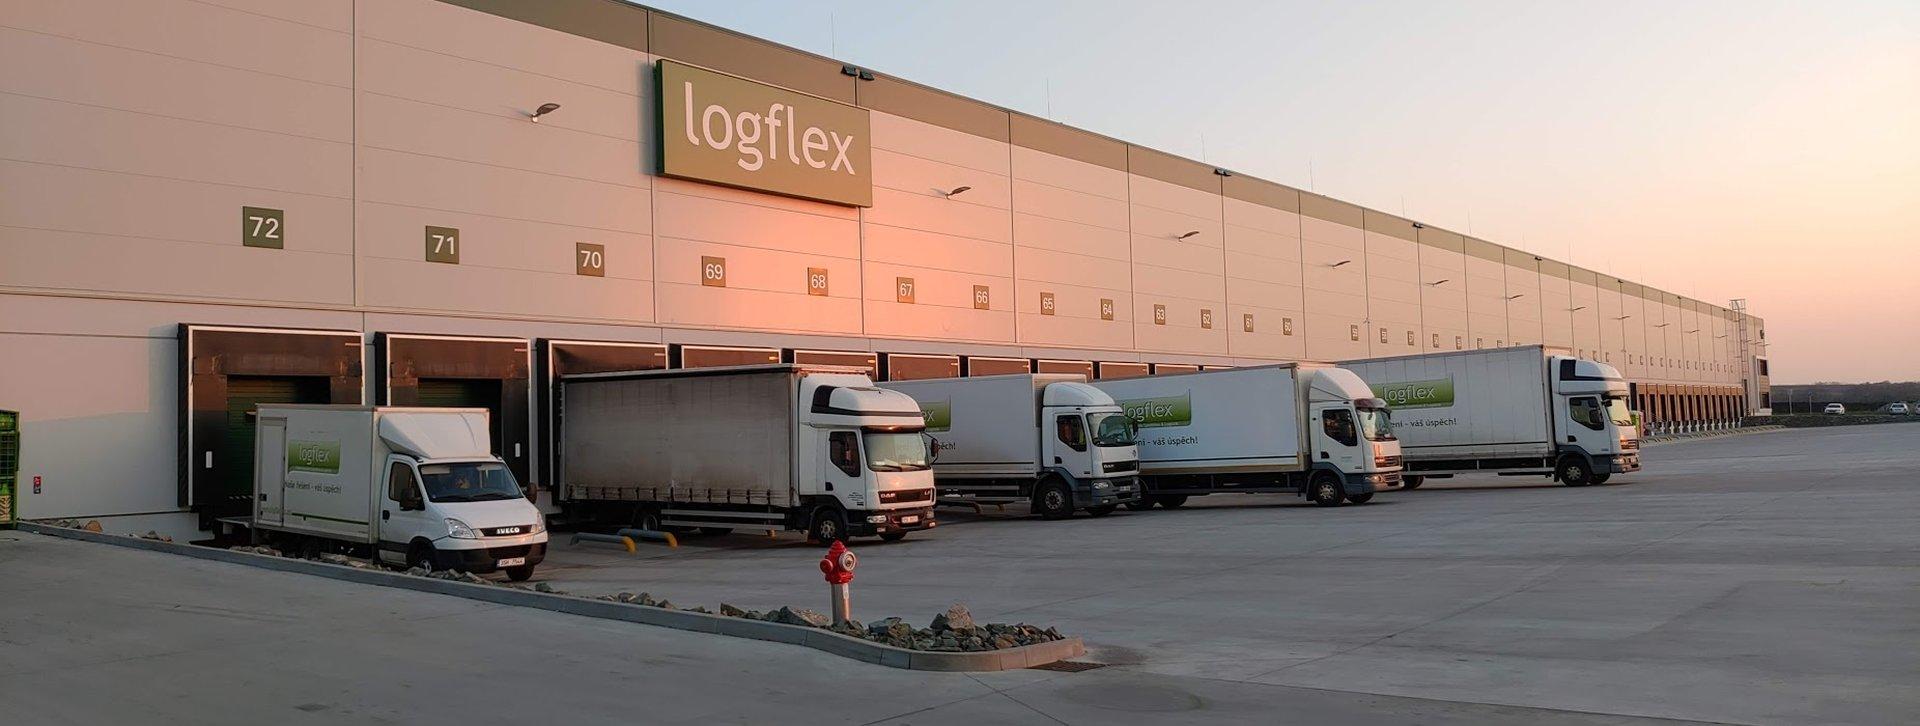 Logflex 3